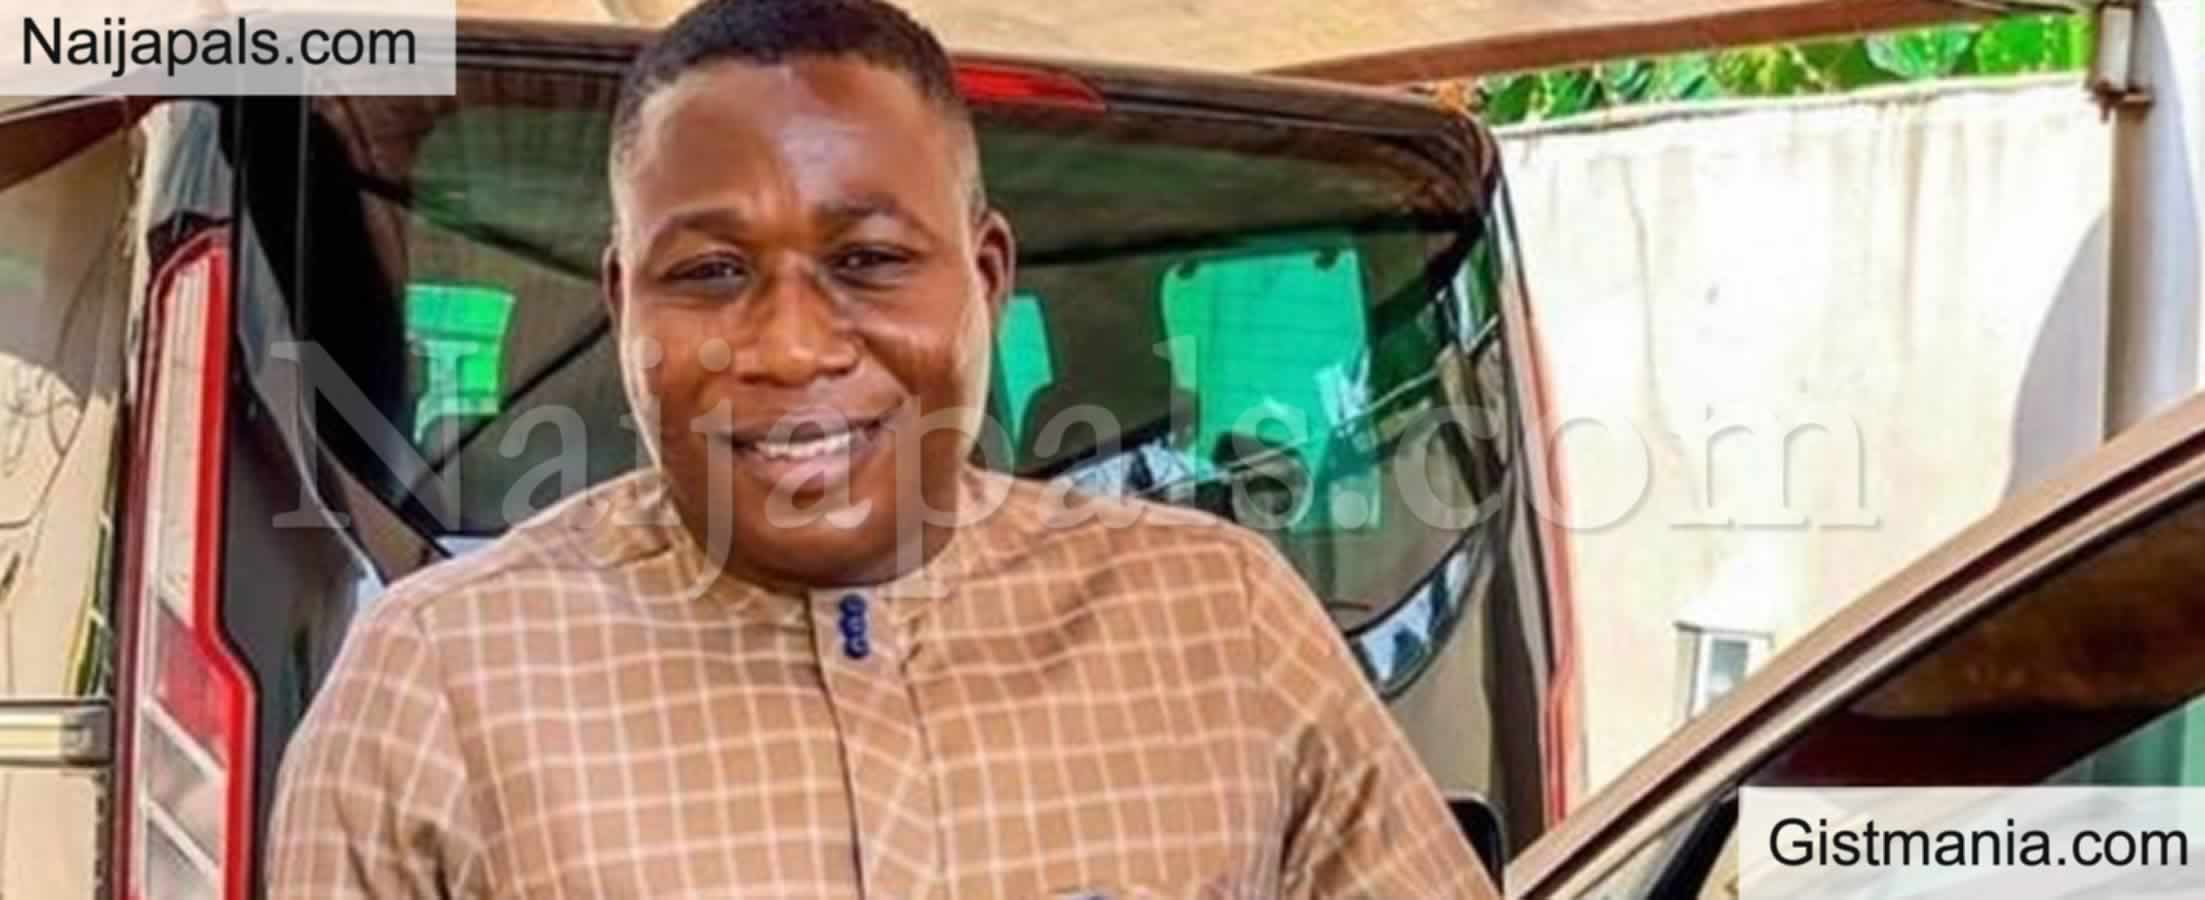 <img alt='.' class='lazyload' data-src='https://img.gistmania.com/emot/comment.gif' /> <b>Sunday Igboho Has Been Poisoned In Cotonou Prison</b> - Investigative Journalist Kemi Olunloyo